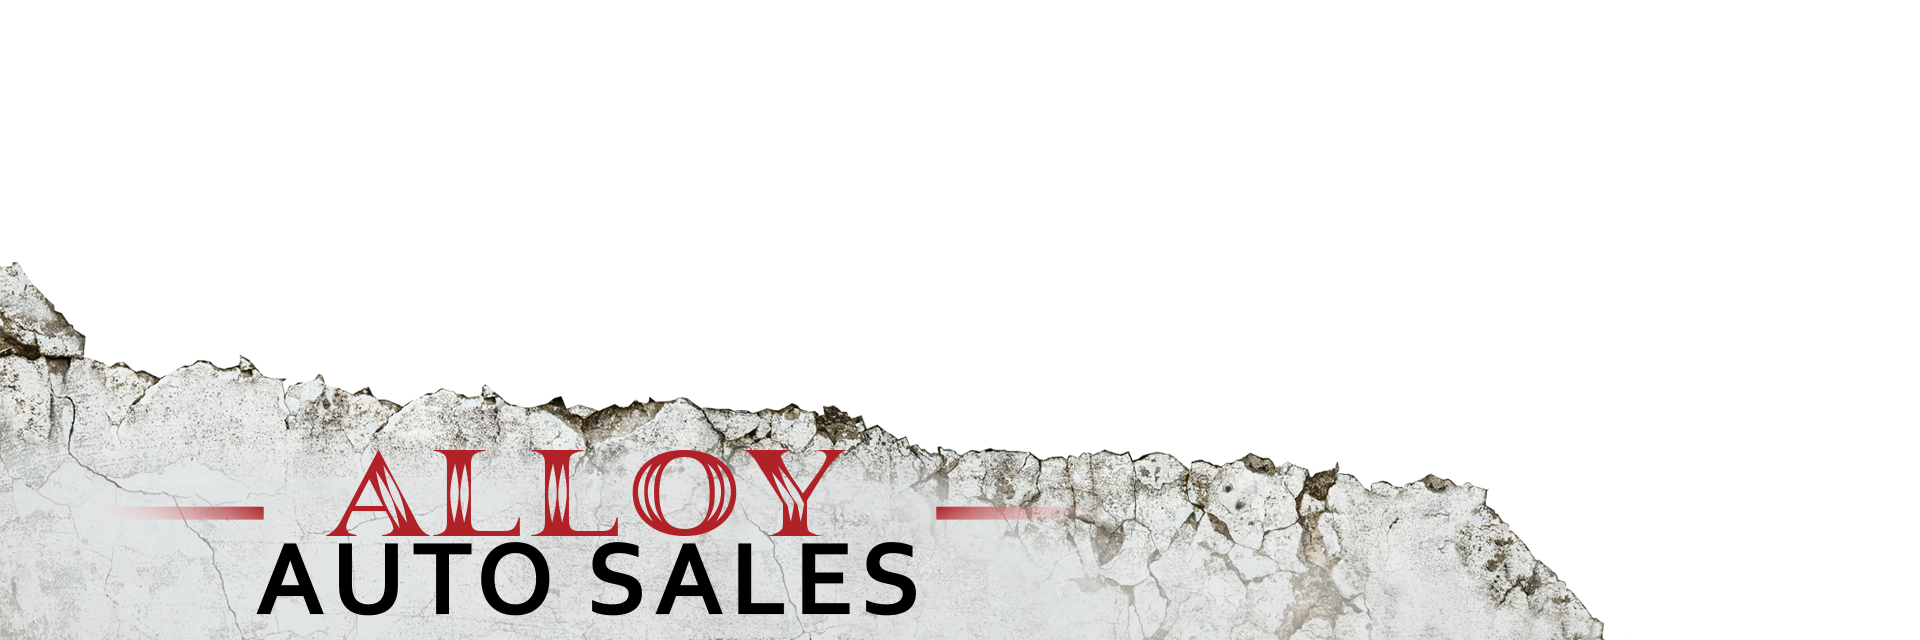 Alloy Auto Sales